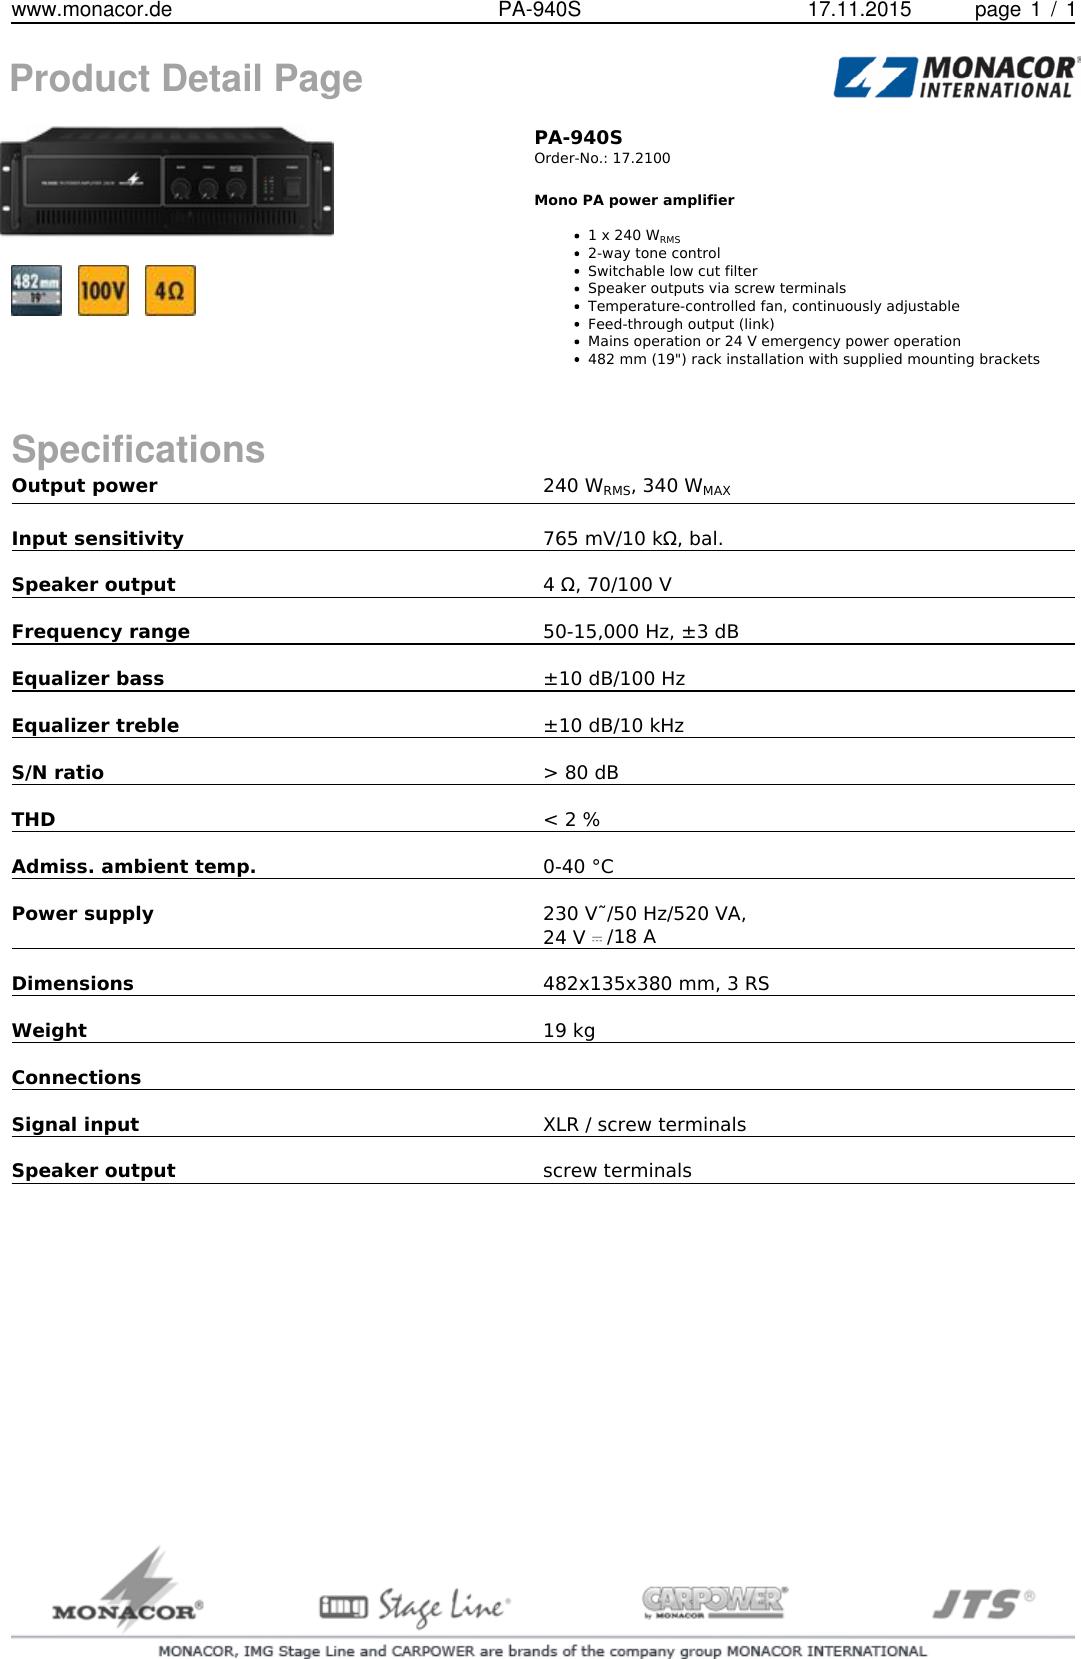 Install guide flc-al(rs)-ch4-en   manualzz. Com.